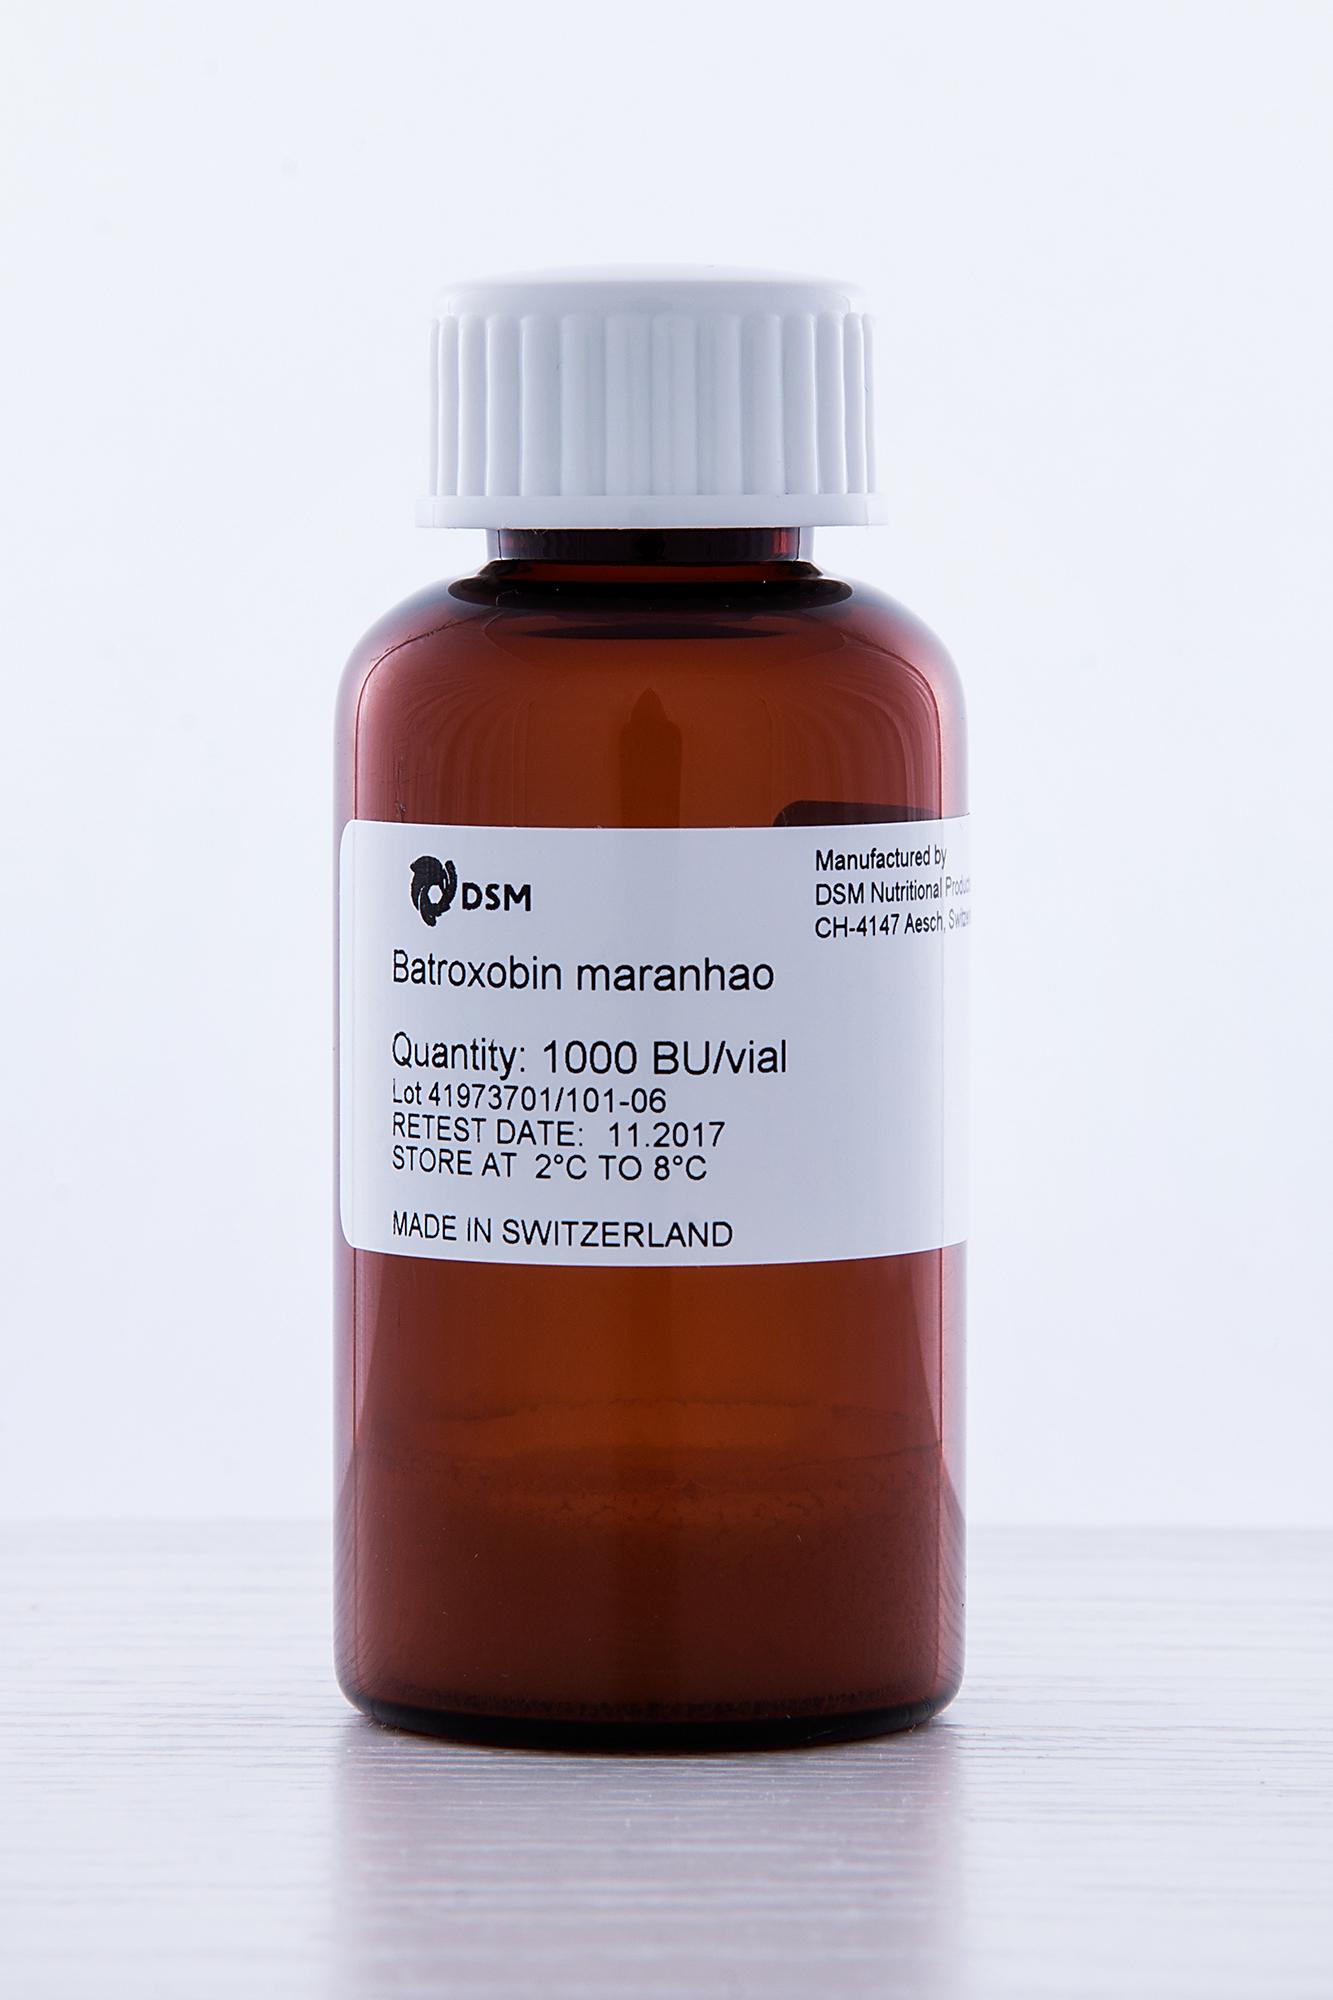 Snake venom enzyme batroxobin maranhao